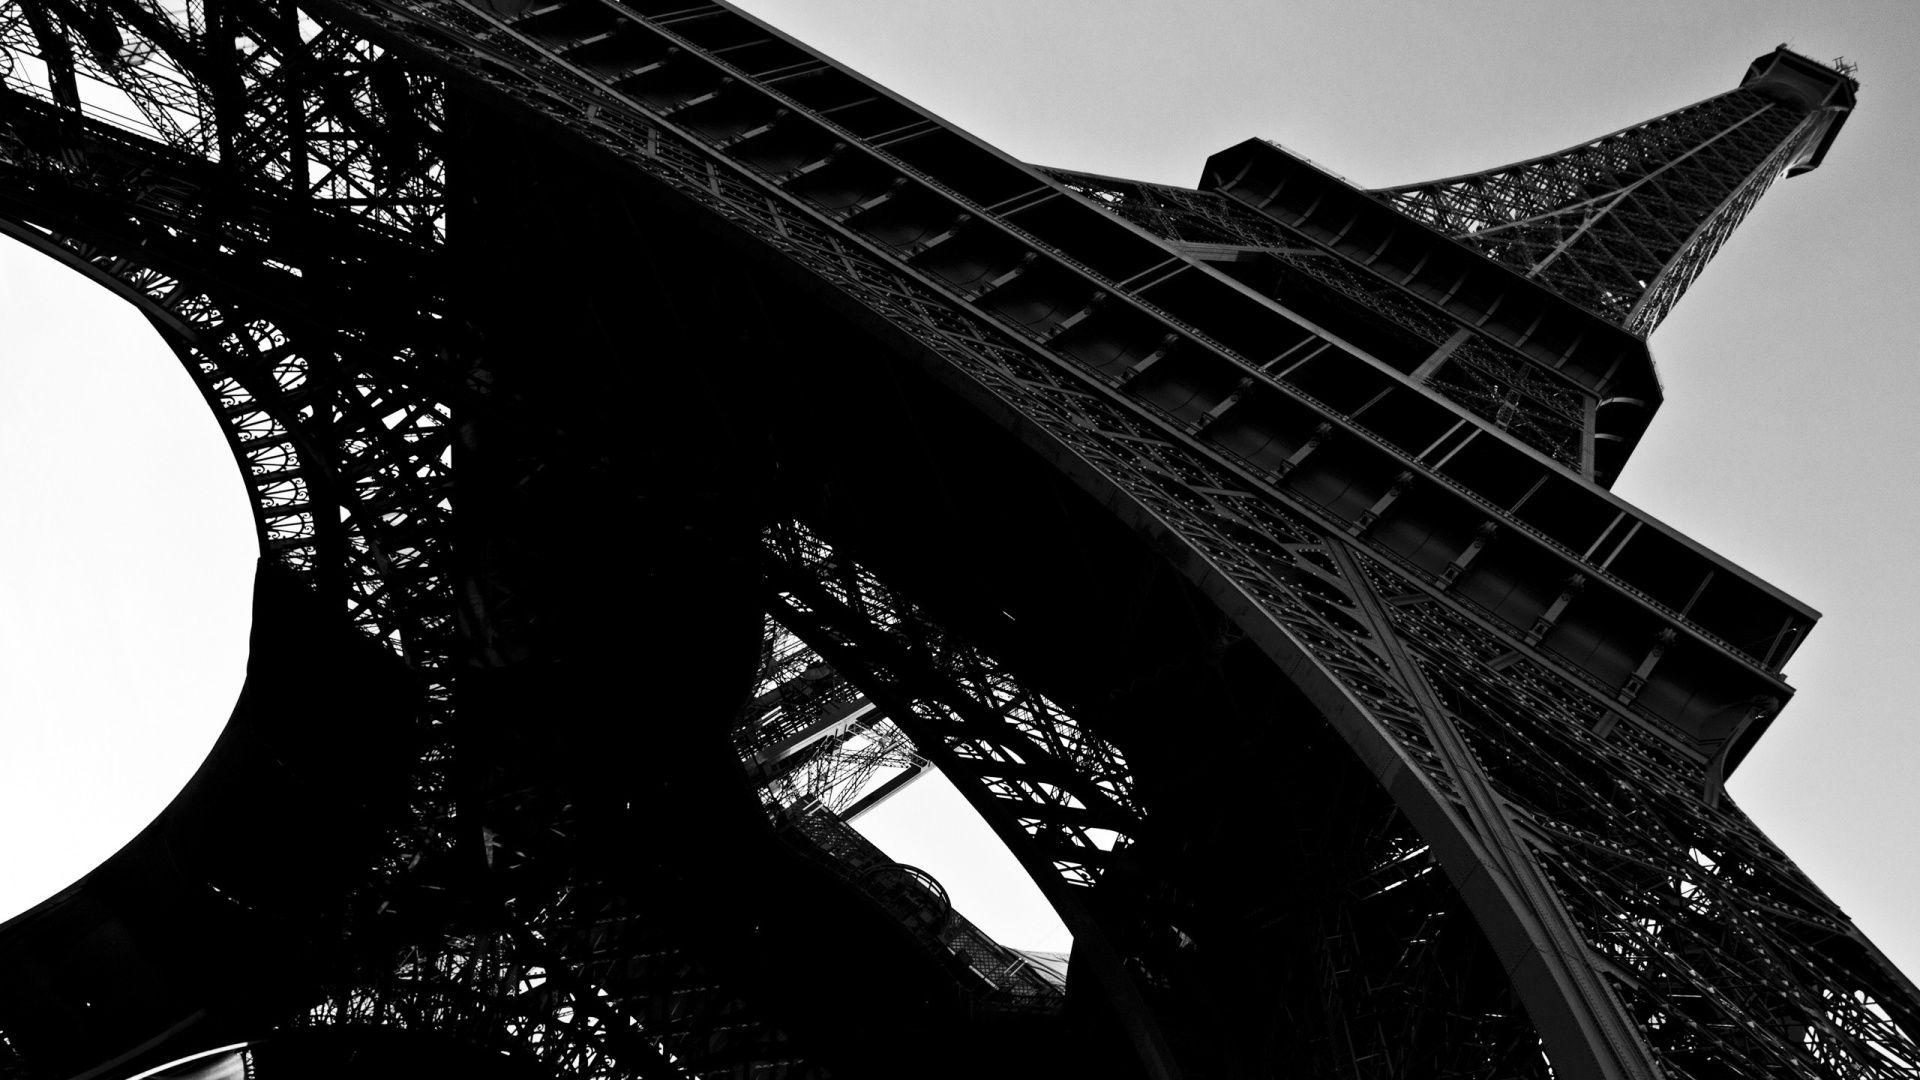 Eiffel Tower Hd Wallpaper Black And White HD Wallpaper